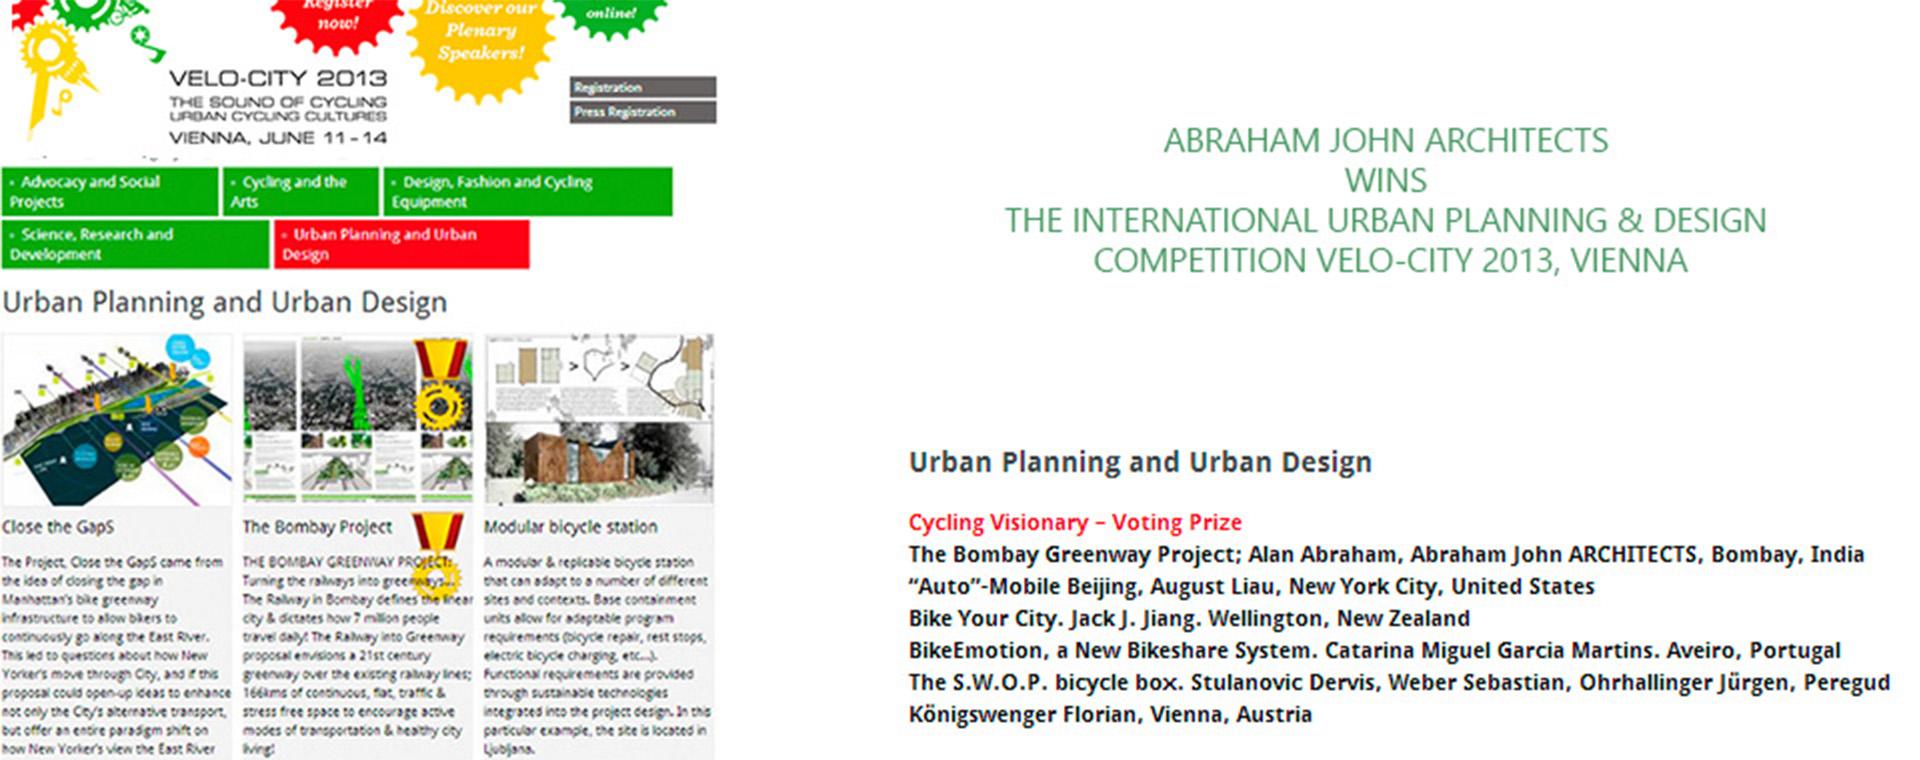 ABRAHAM JOHN ARCHITECTS